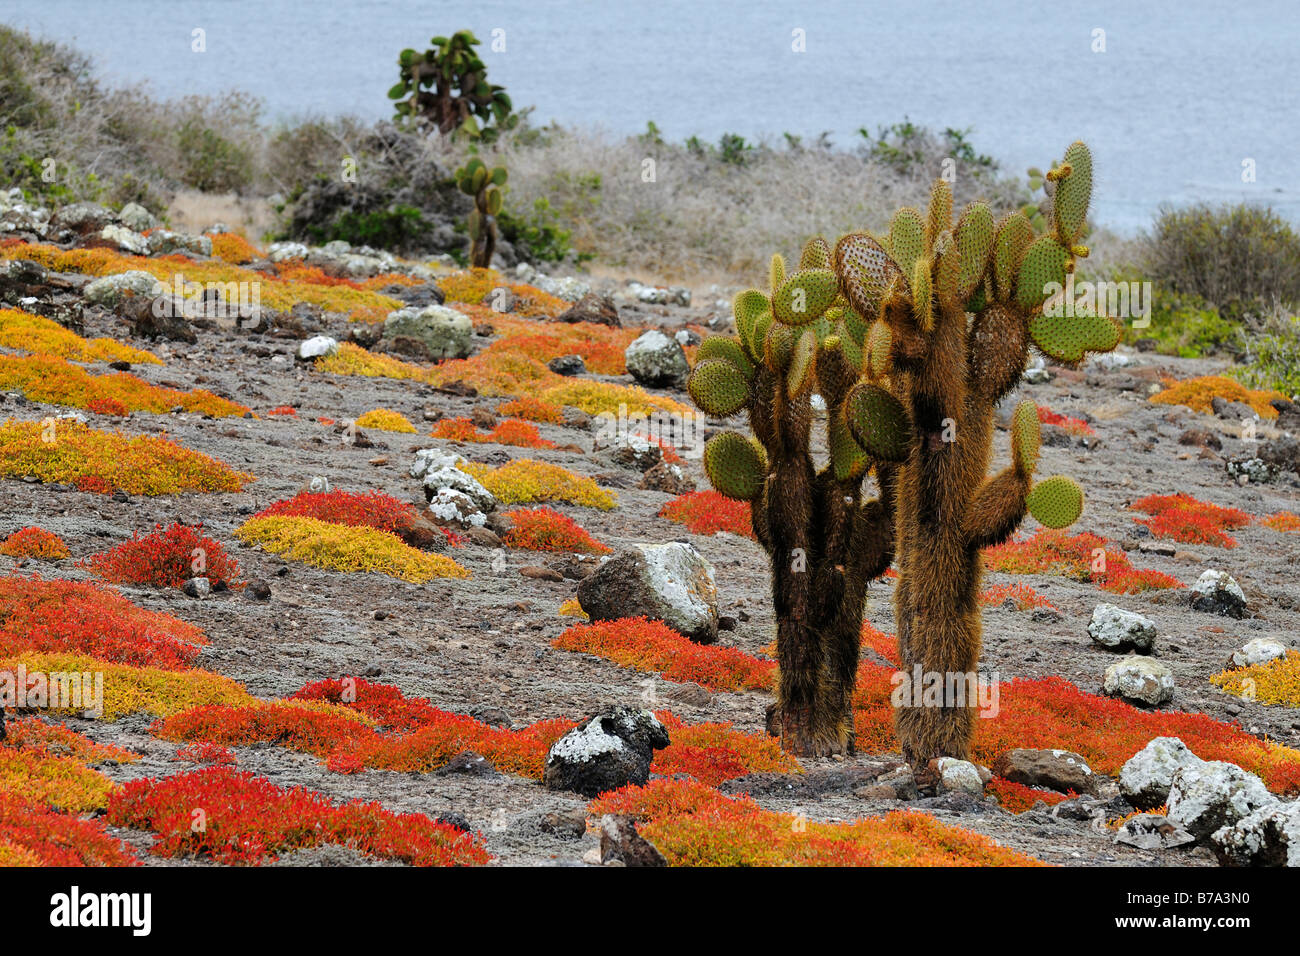 Opuntias (Opuntia echios) growing out of a carpet of Galapagos sesuvium, Plaza Sur Island, Galapagos Islands, Ecuador, - Stock Image